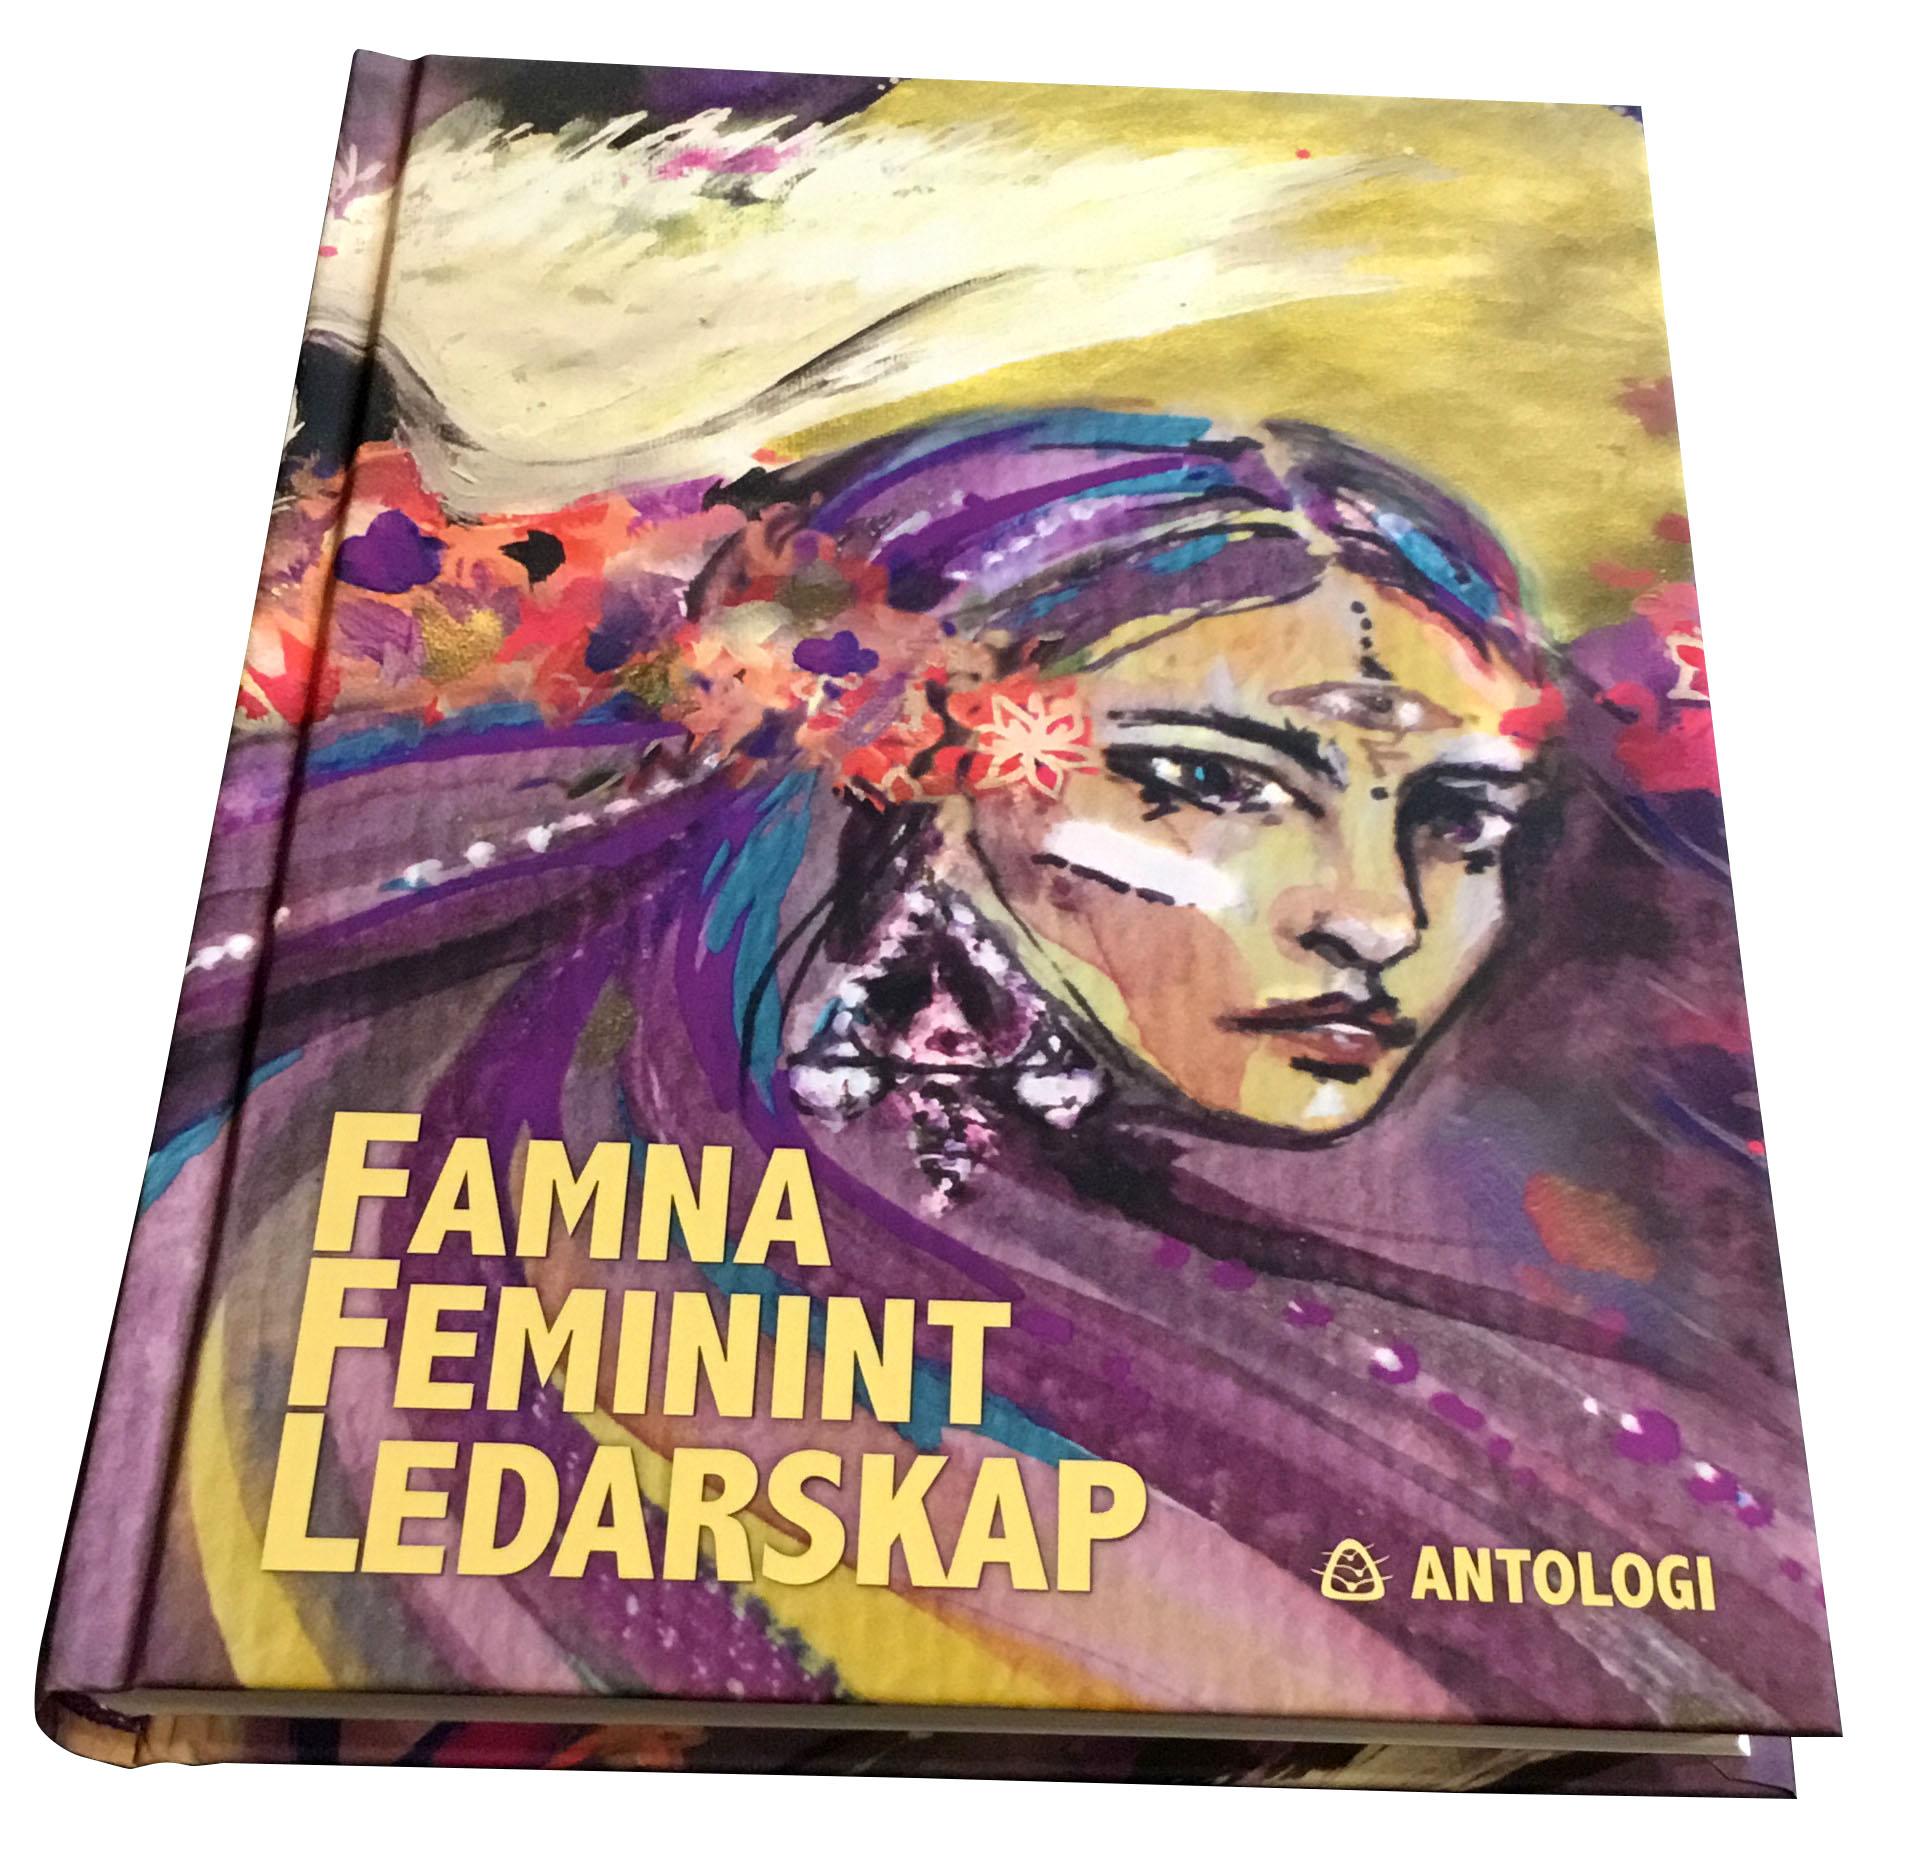 Famna Feminint Ledarskap / Antologi